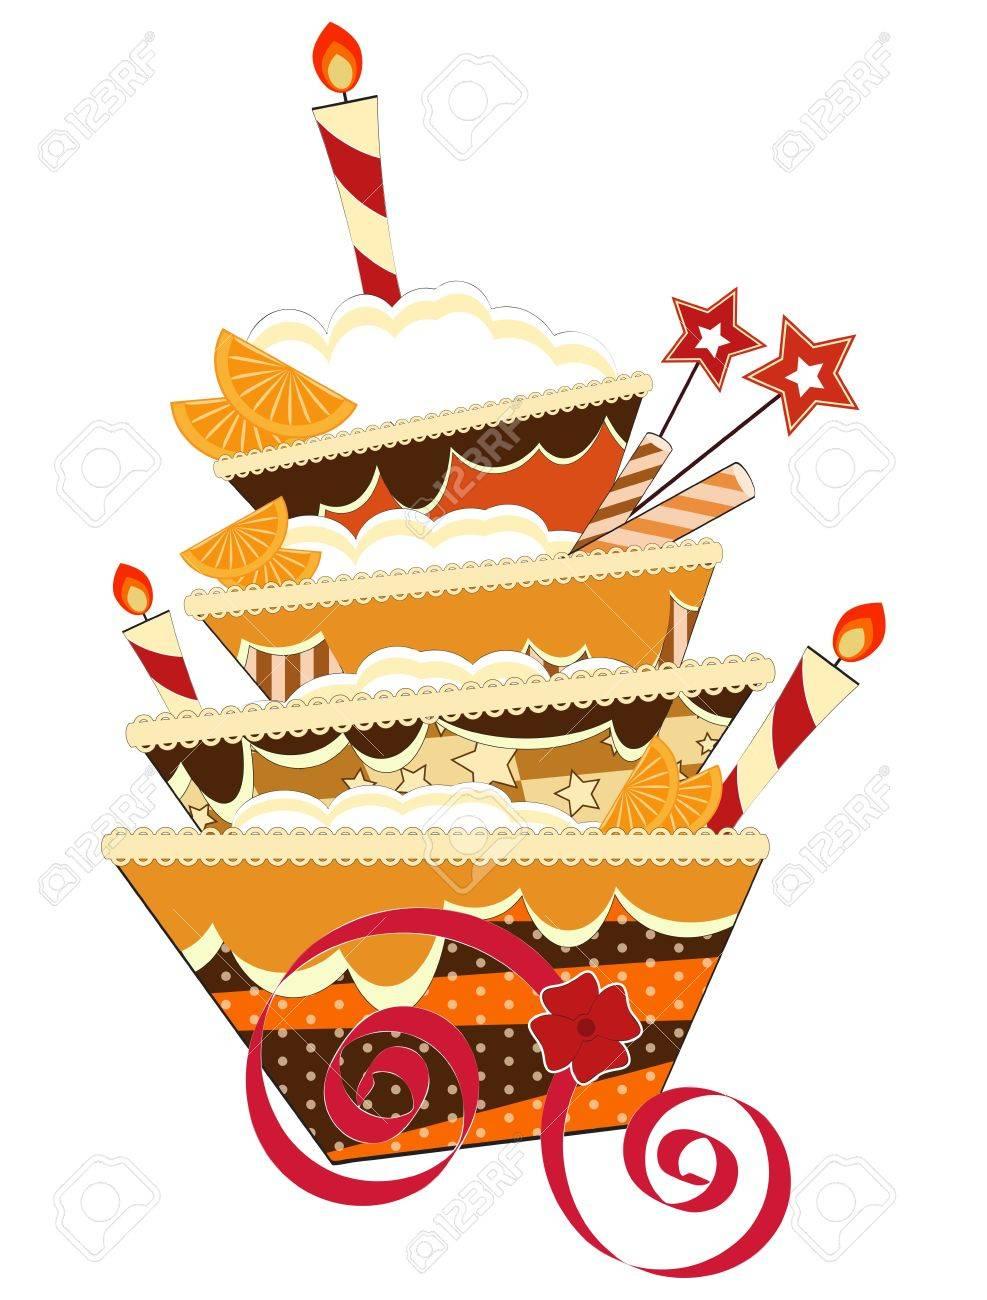 Groovy Big Chocolate Birthday Cake With Burning Candles Royalty Free Personalised Birthday Cards Veneteletsinfo